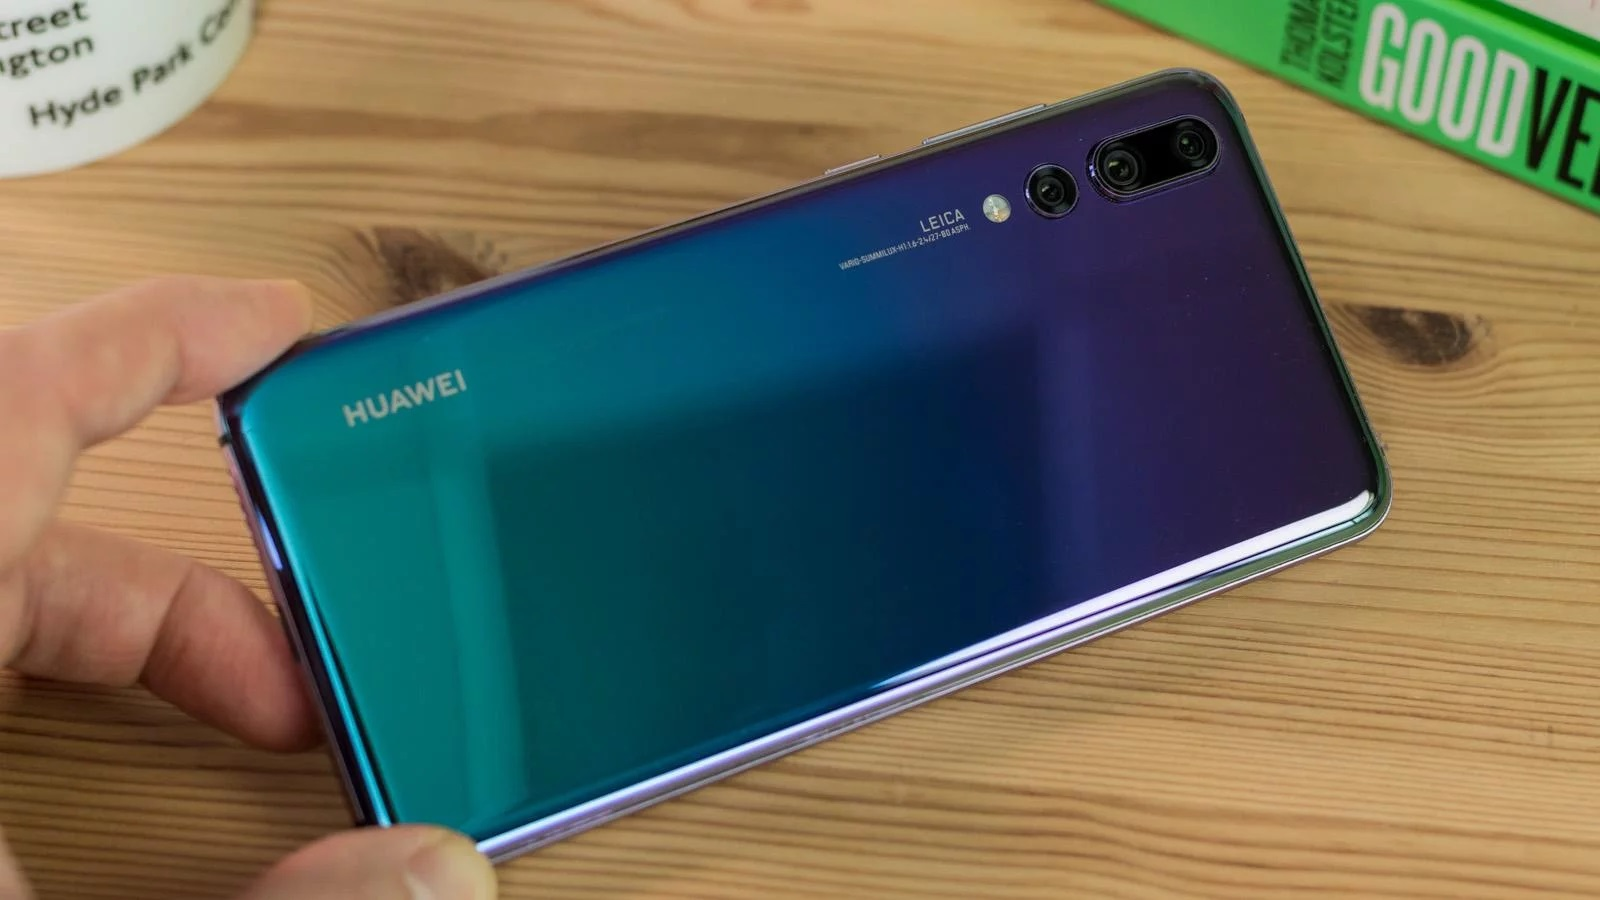 Wsj, Usa a alleati, non usate Huawei